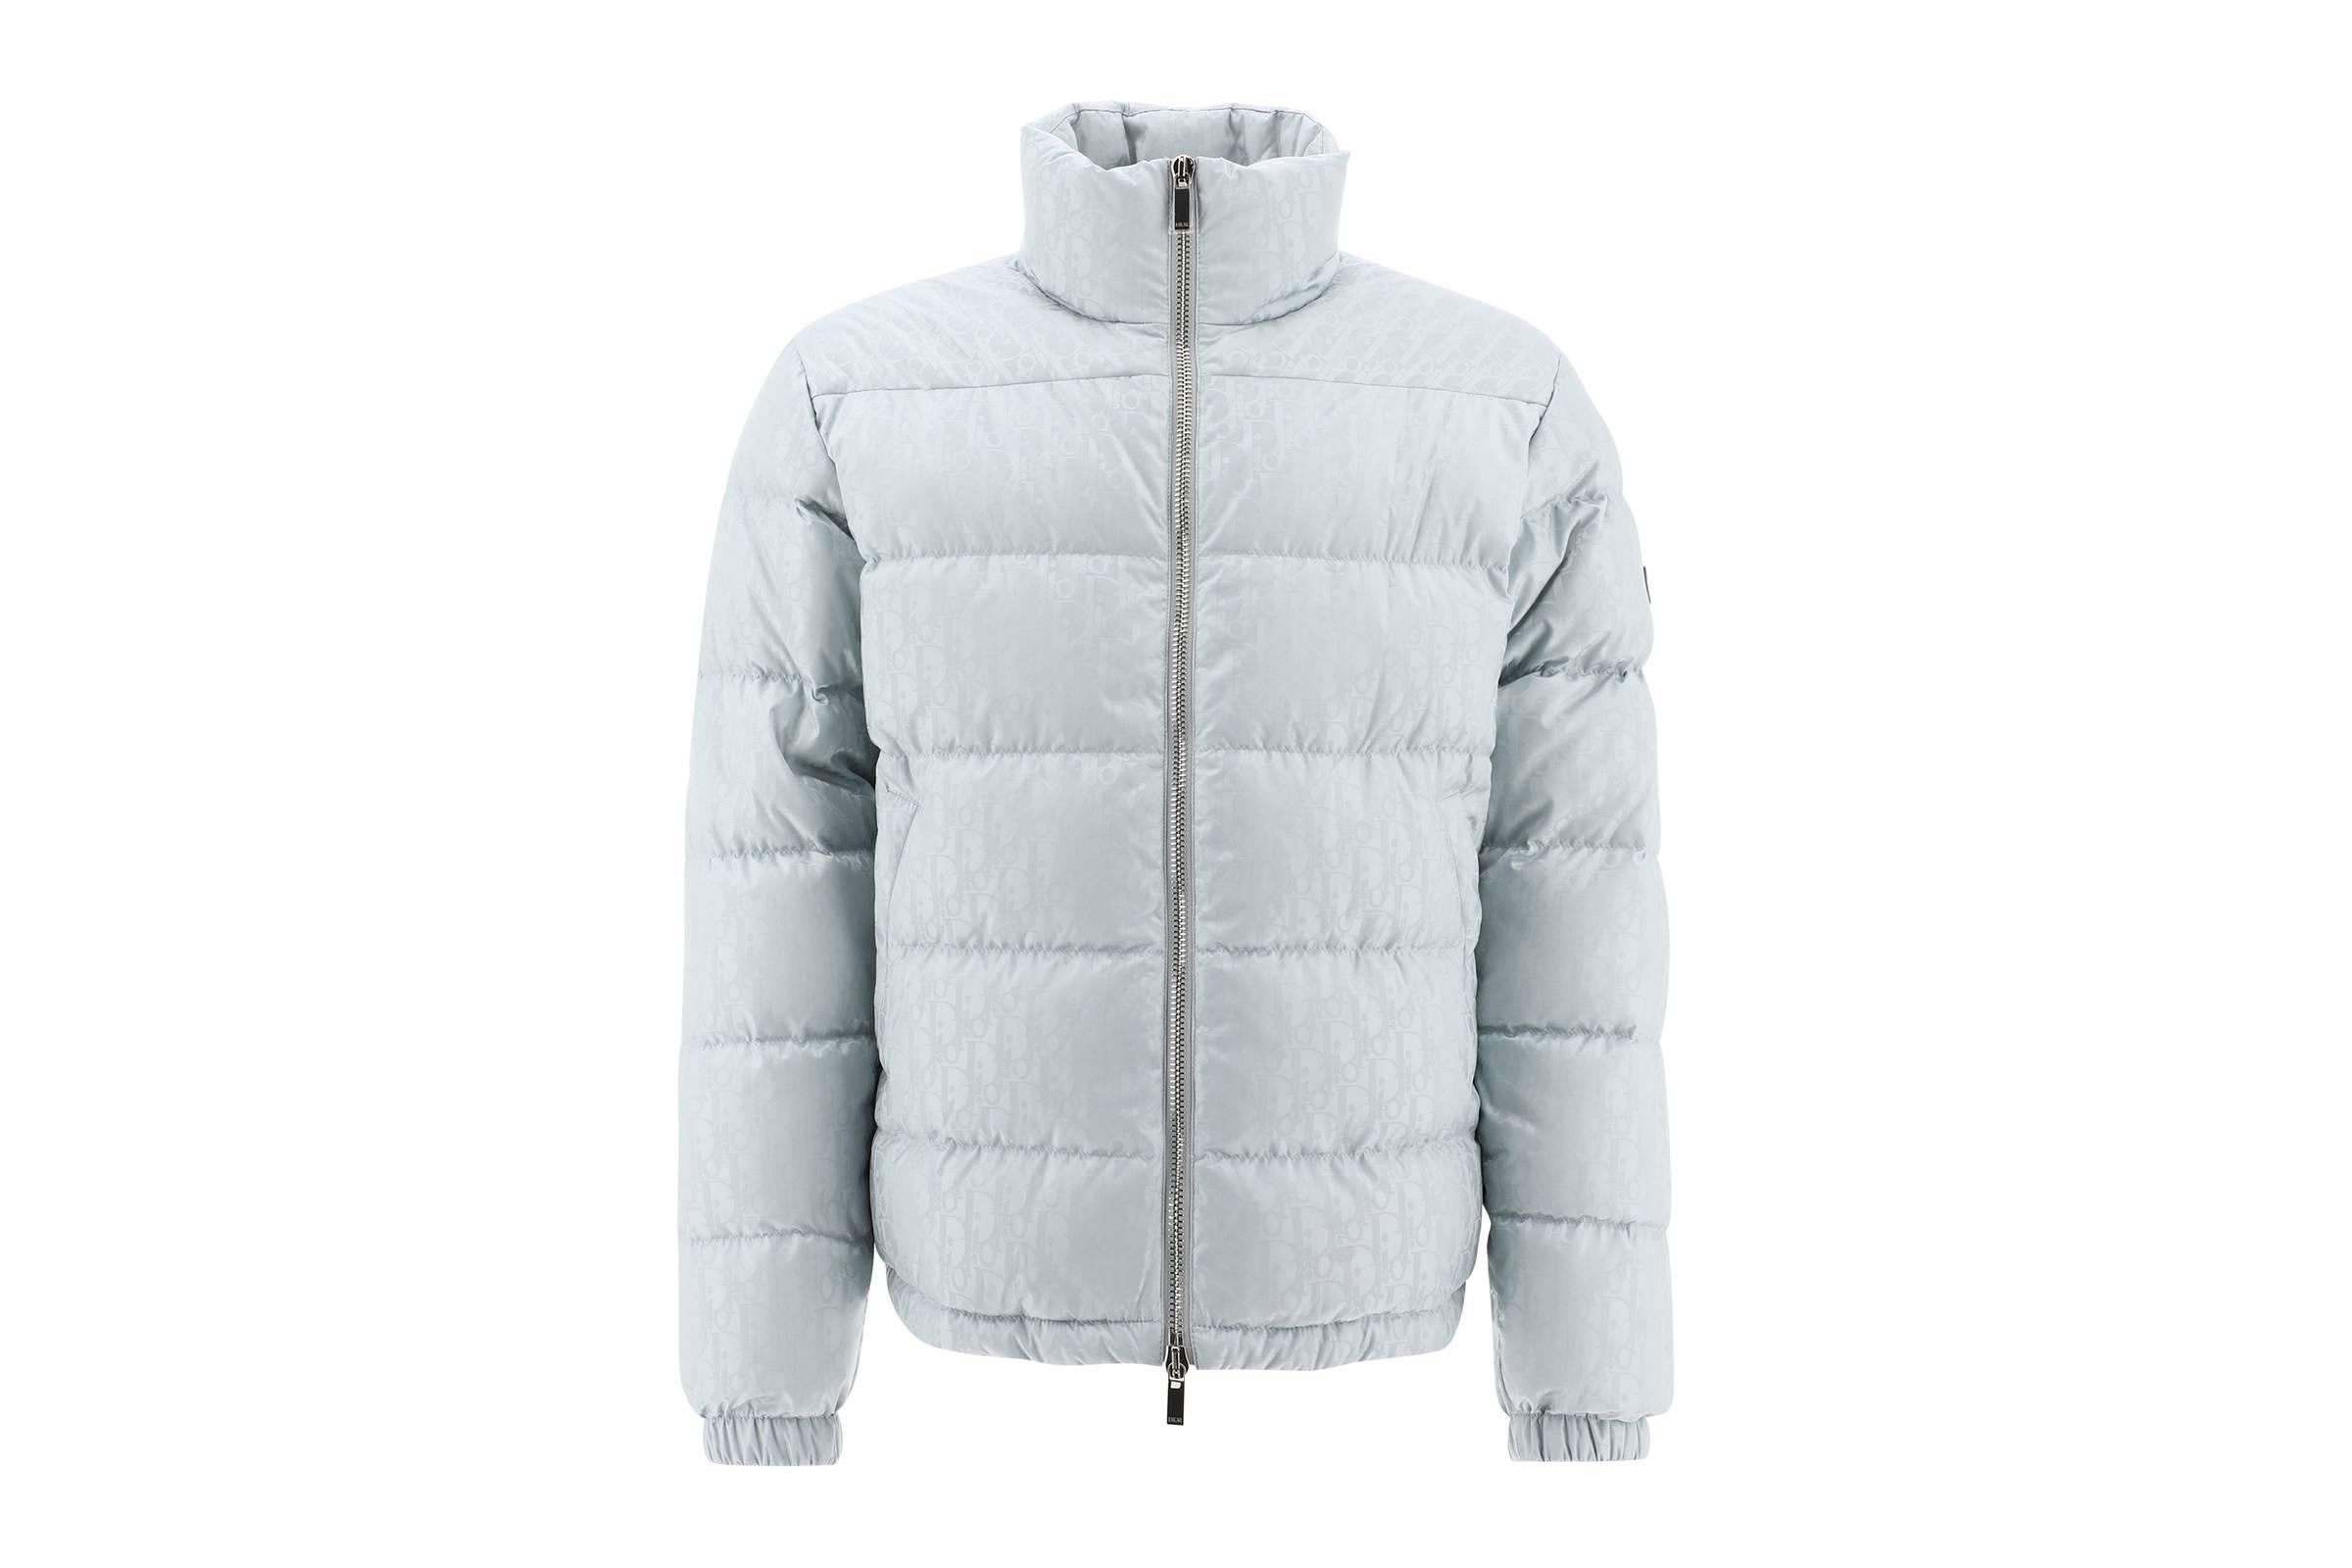 Dior Spring/Summer 2021 Oblique Down Jacket